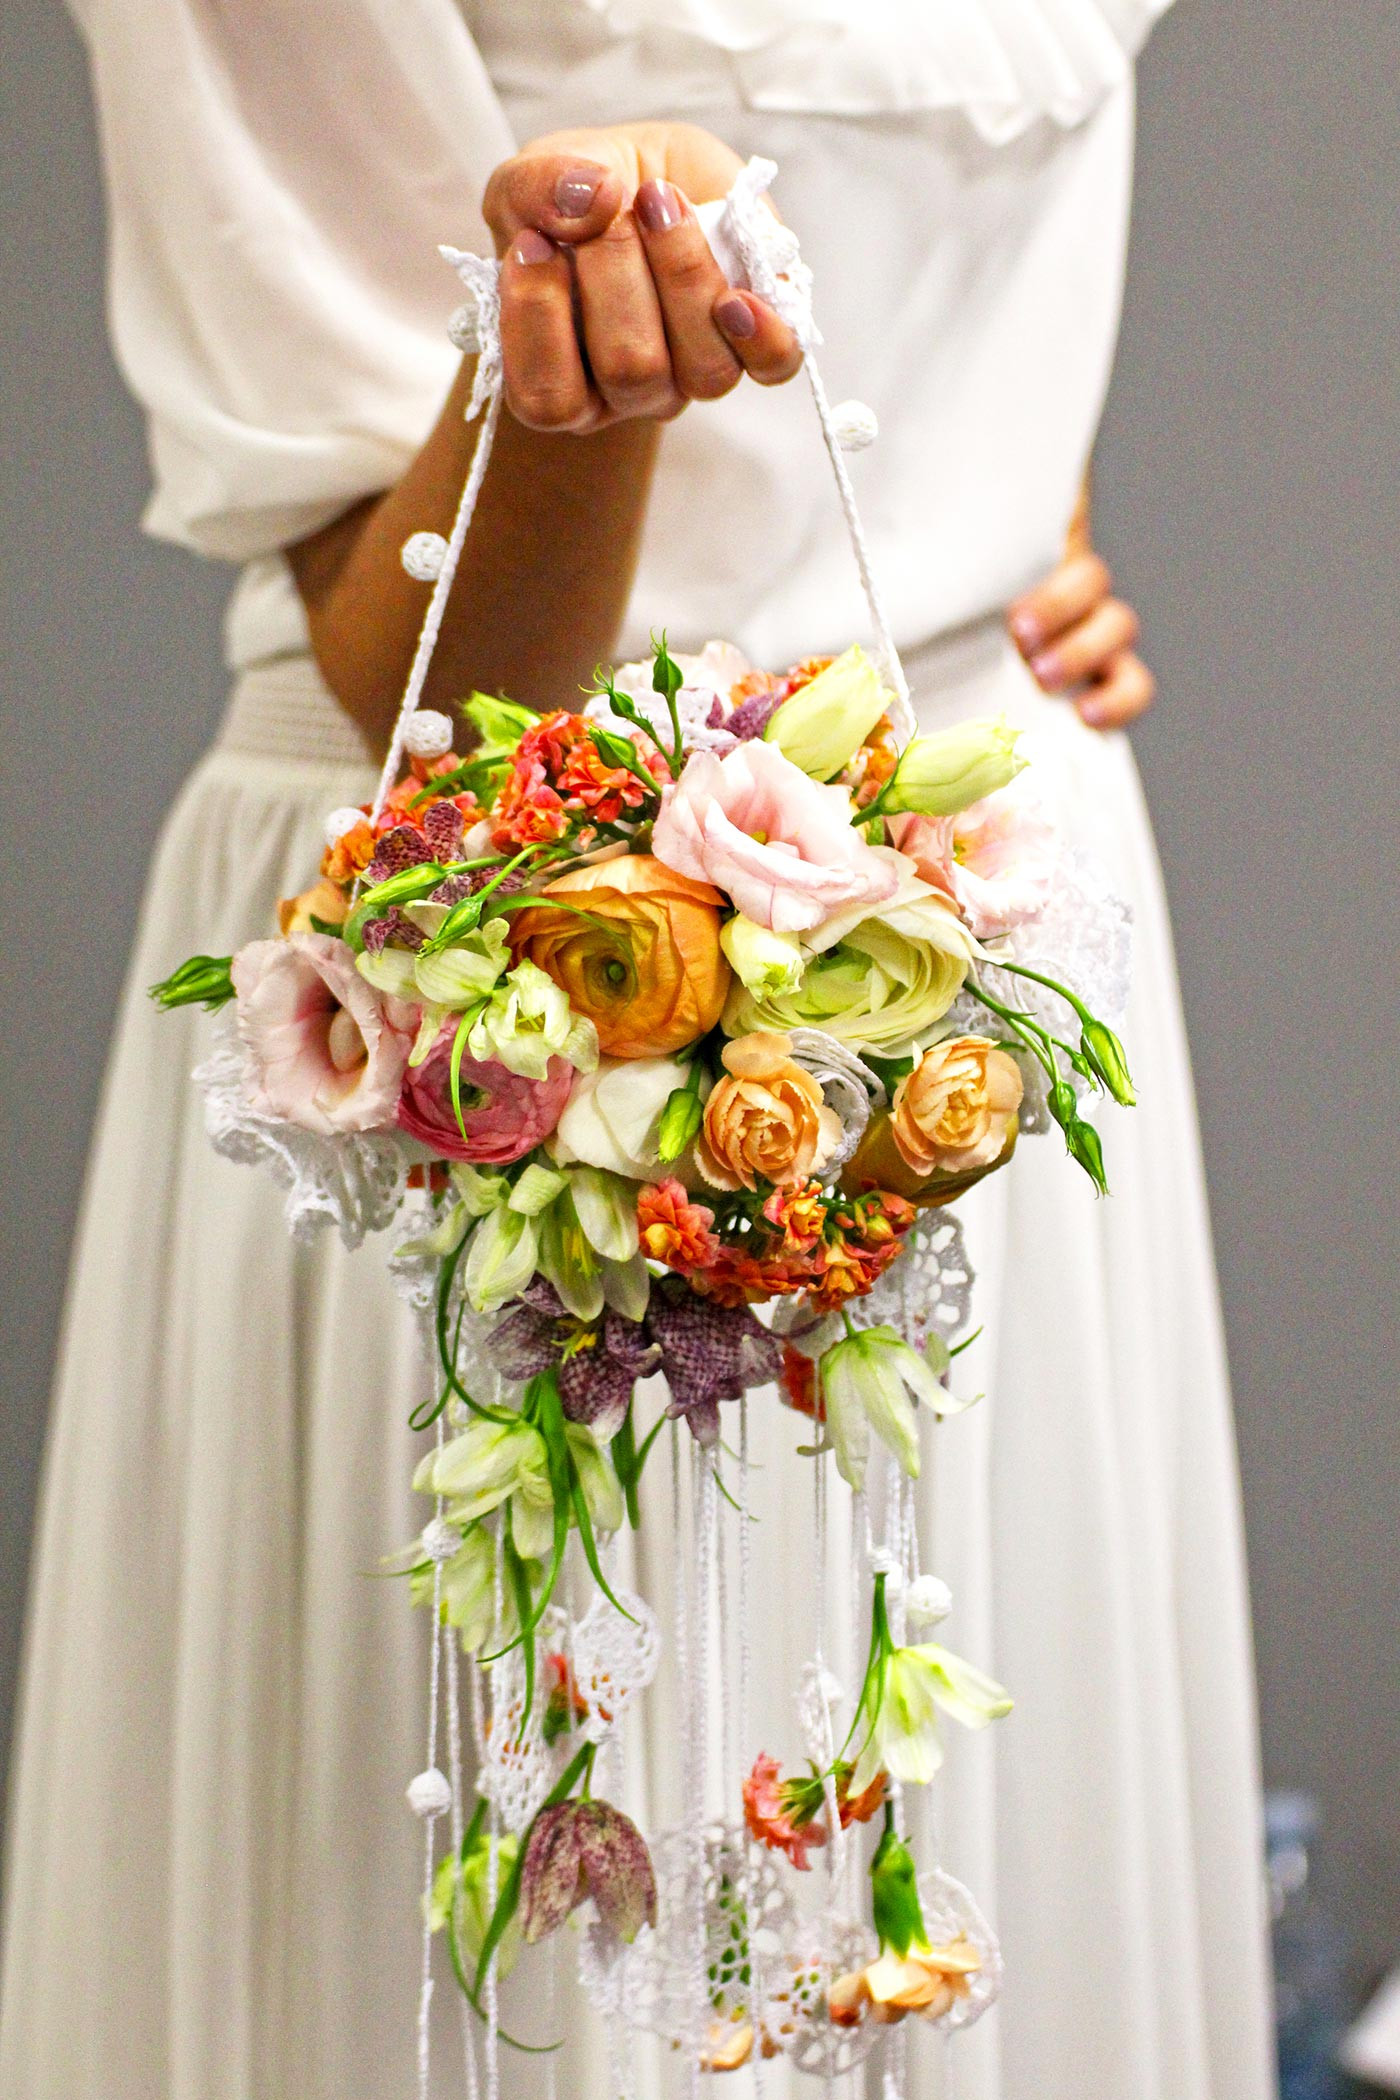 Ranunkel Brautstrauß  Brautstrauß im Vintage Stil mit Ranunkel